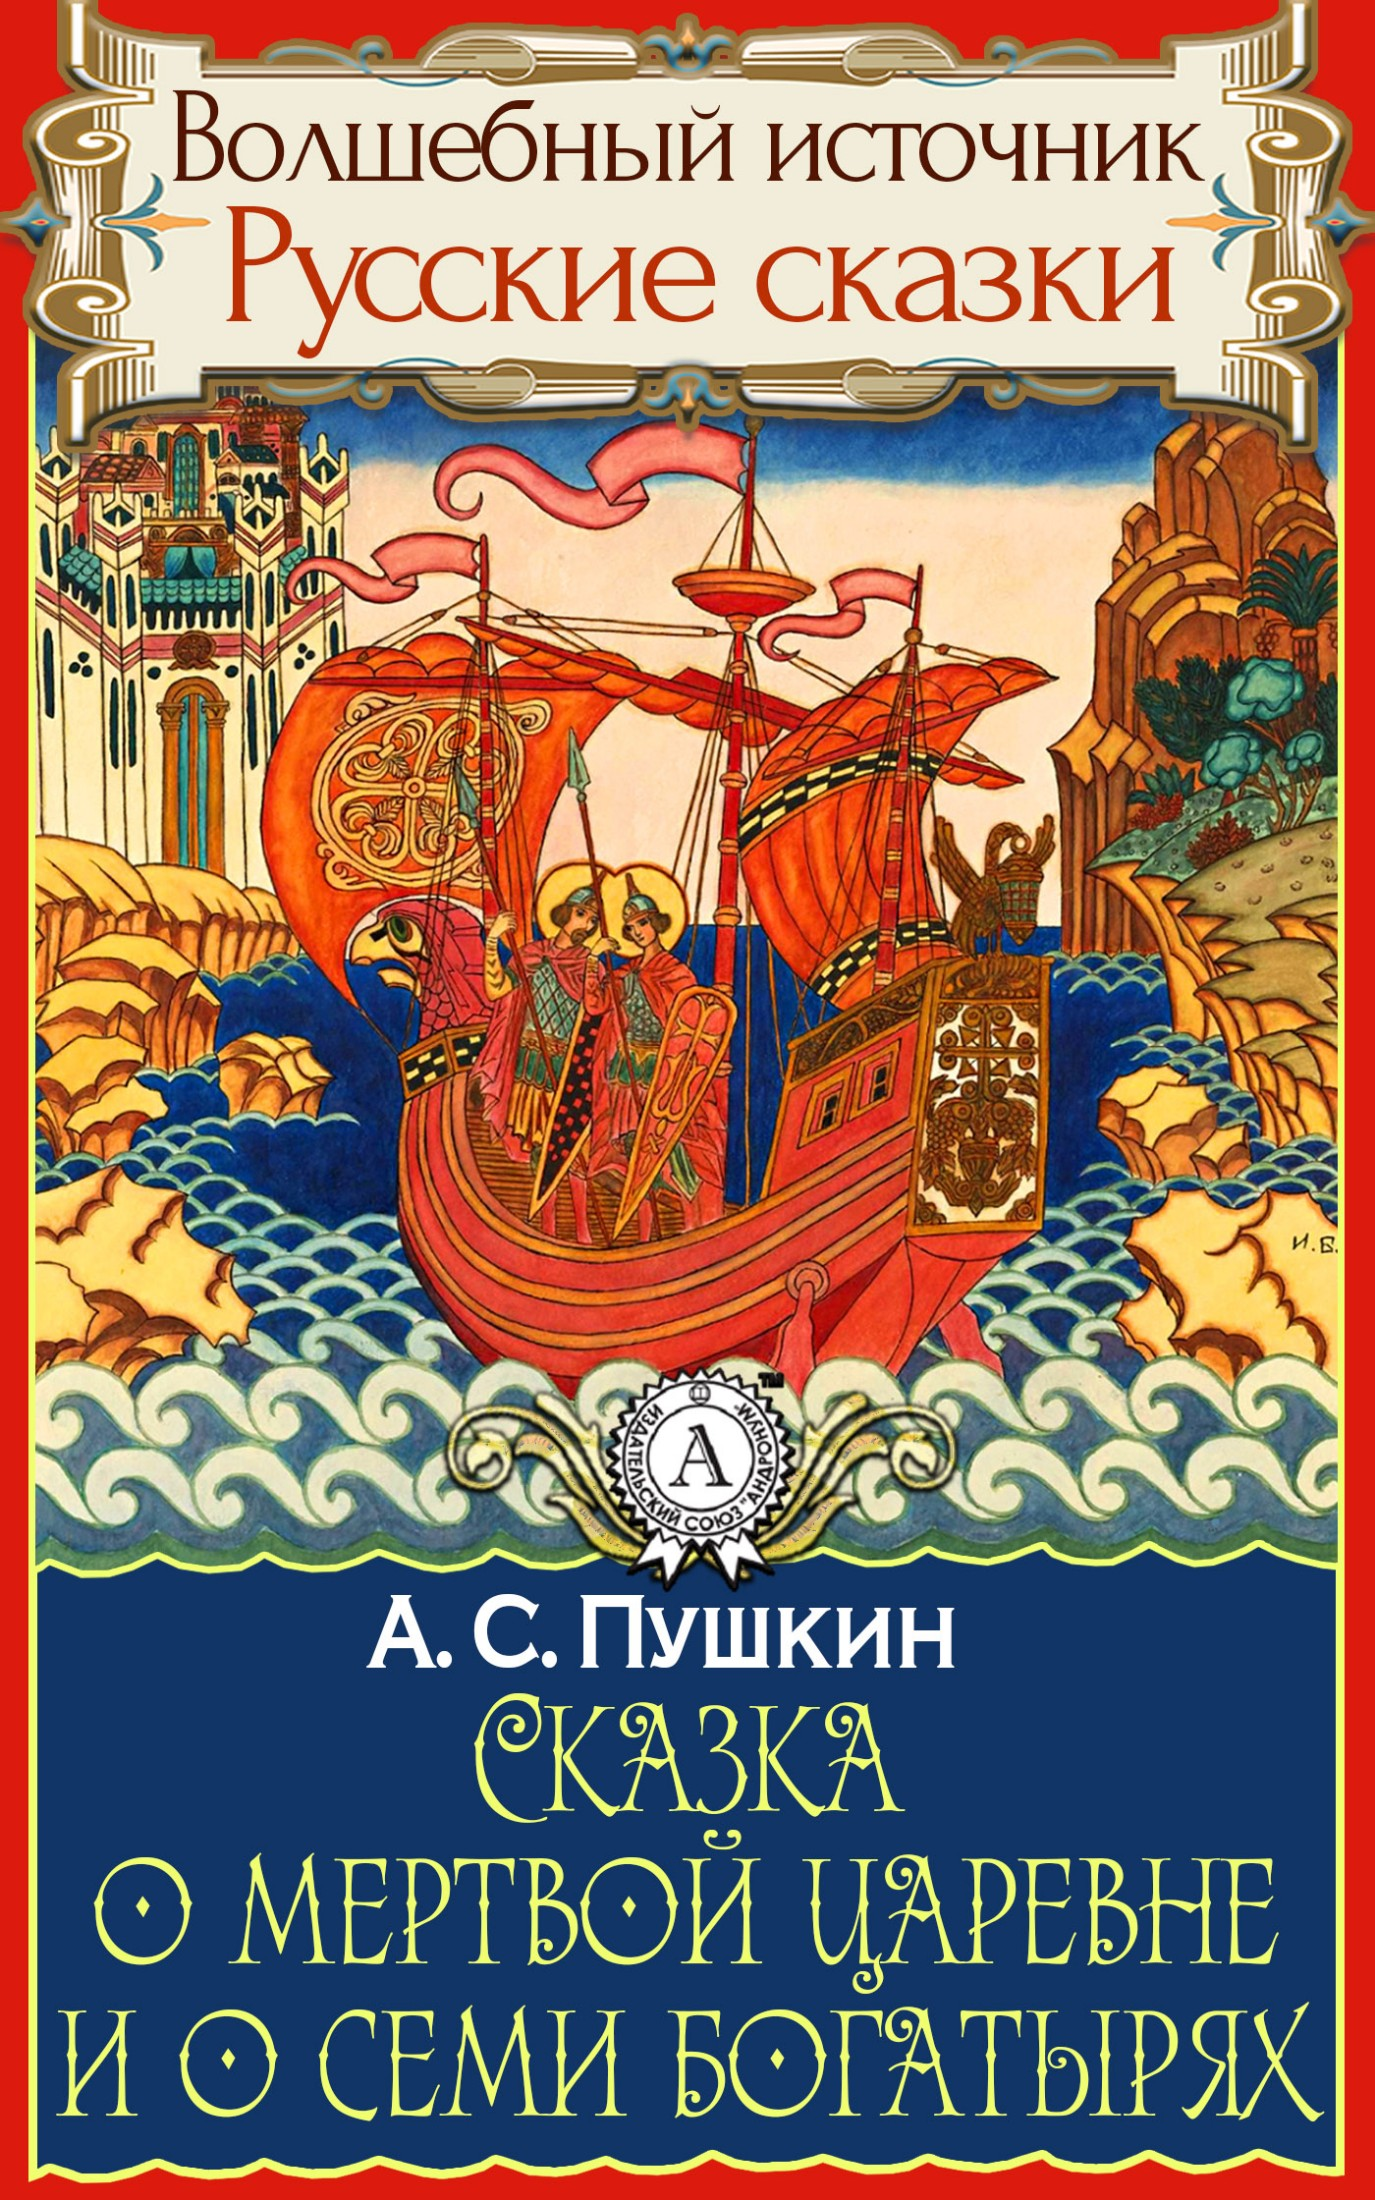 Олександр Пушкін Сказка о мертвой царевне и о семи богатырях